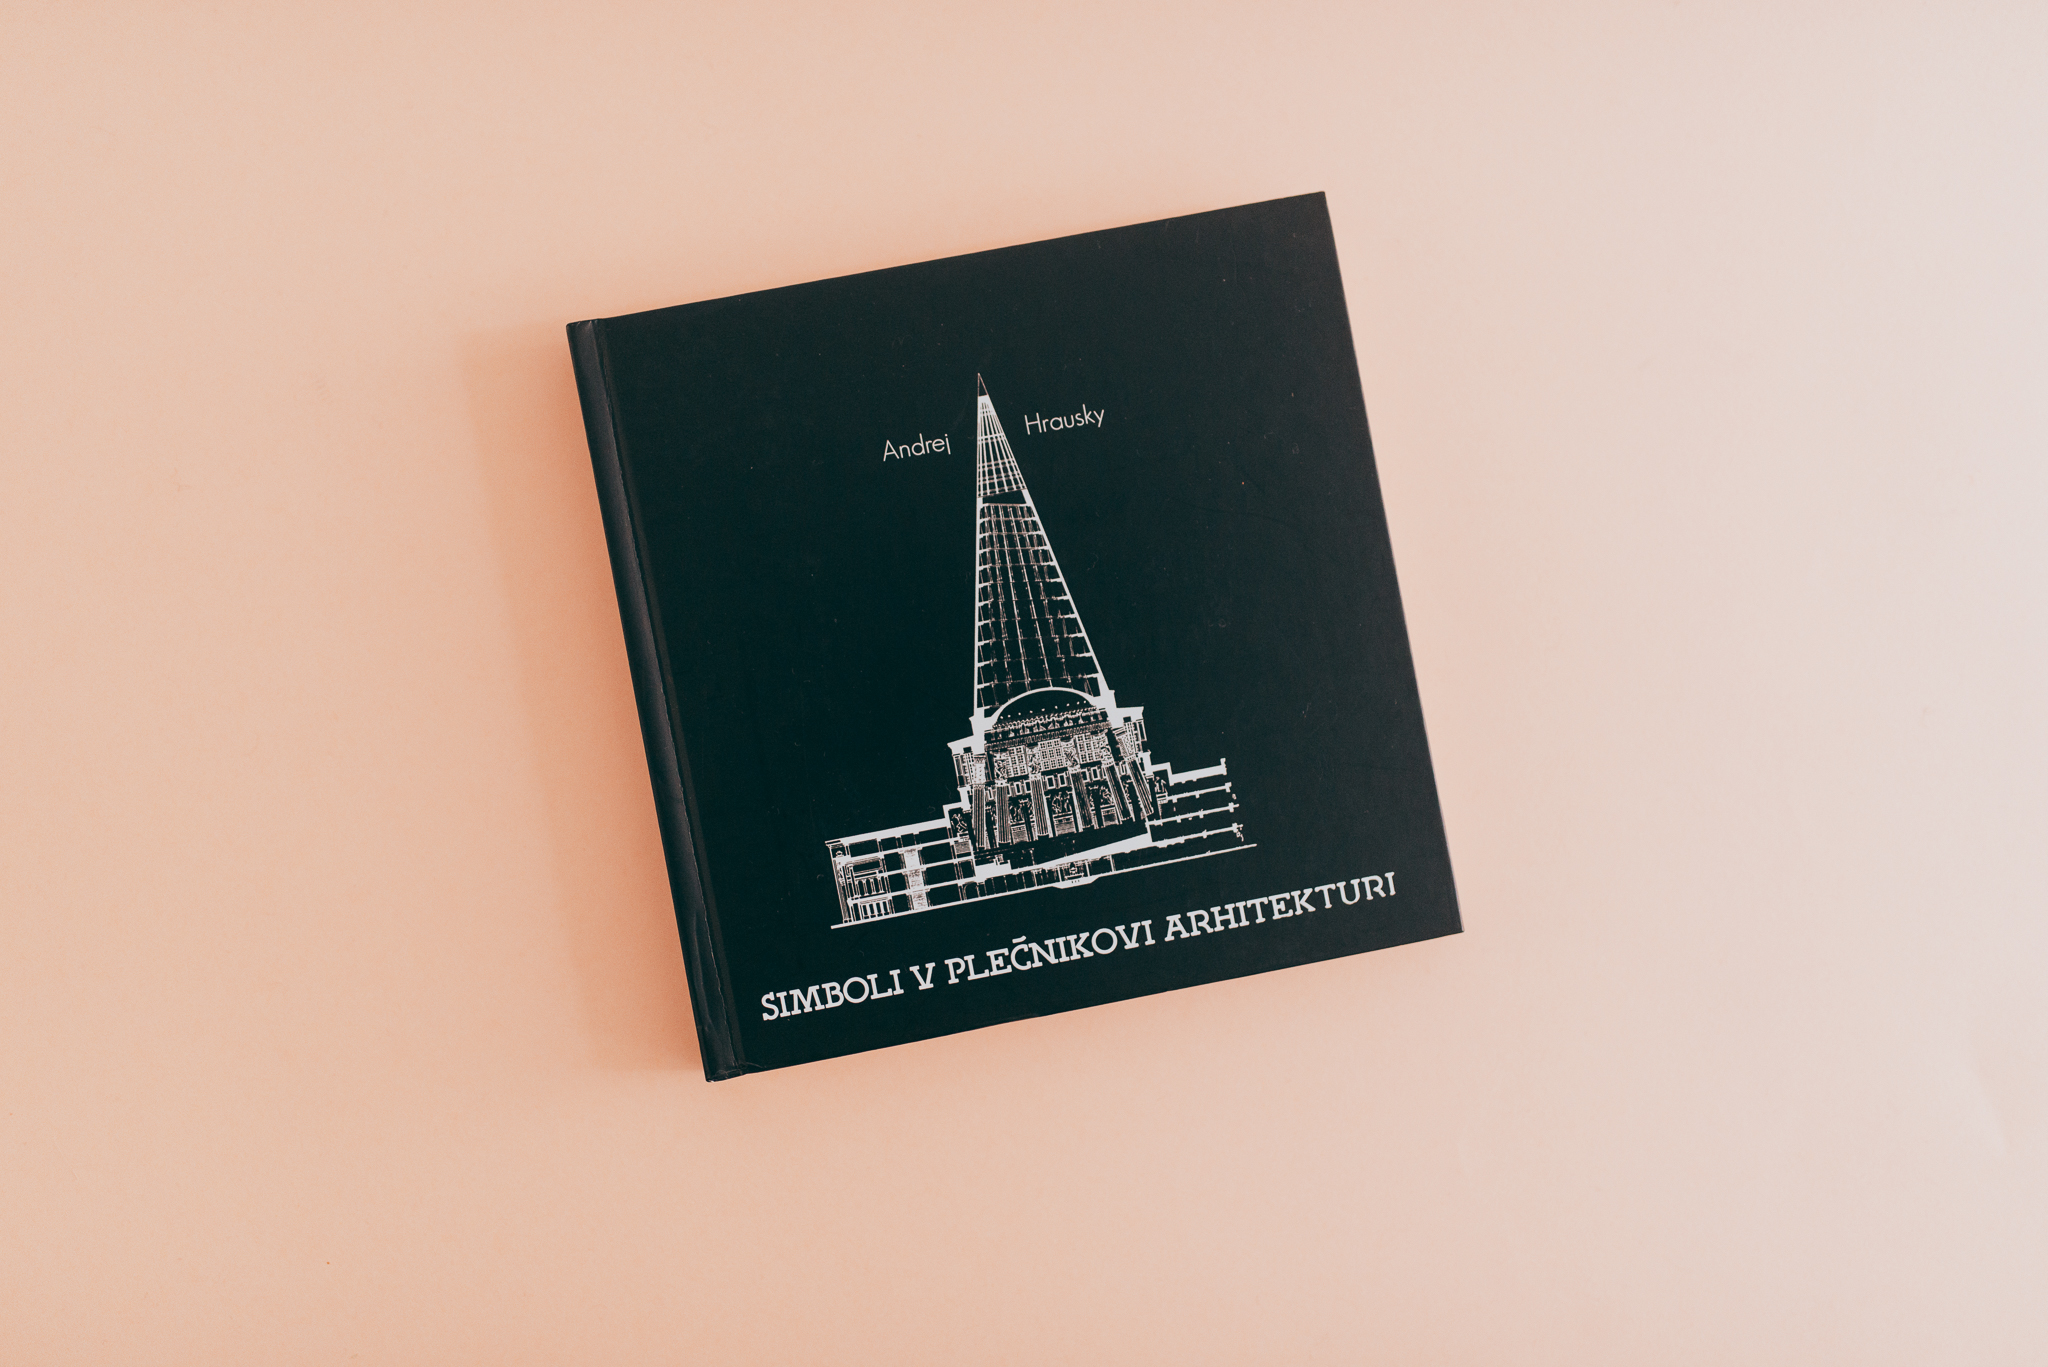 Knjiga Simboli v Plečnikovi arhitekturi